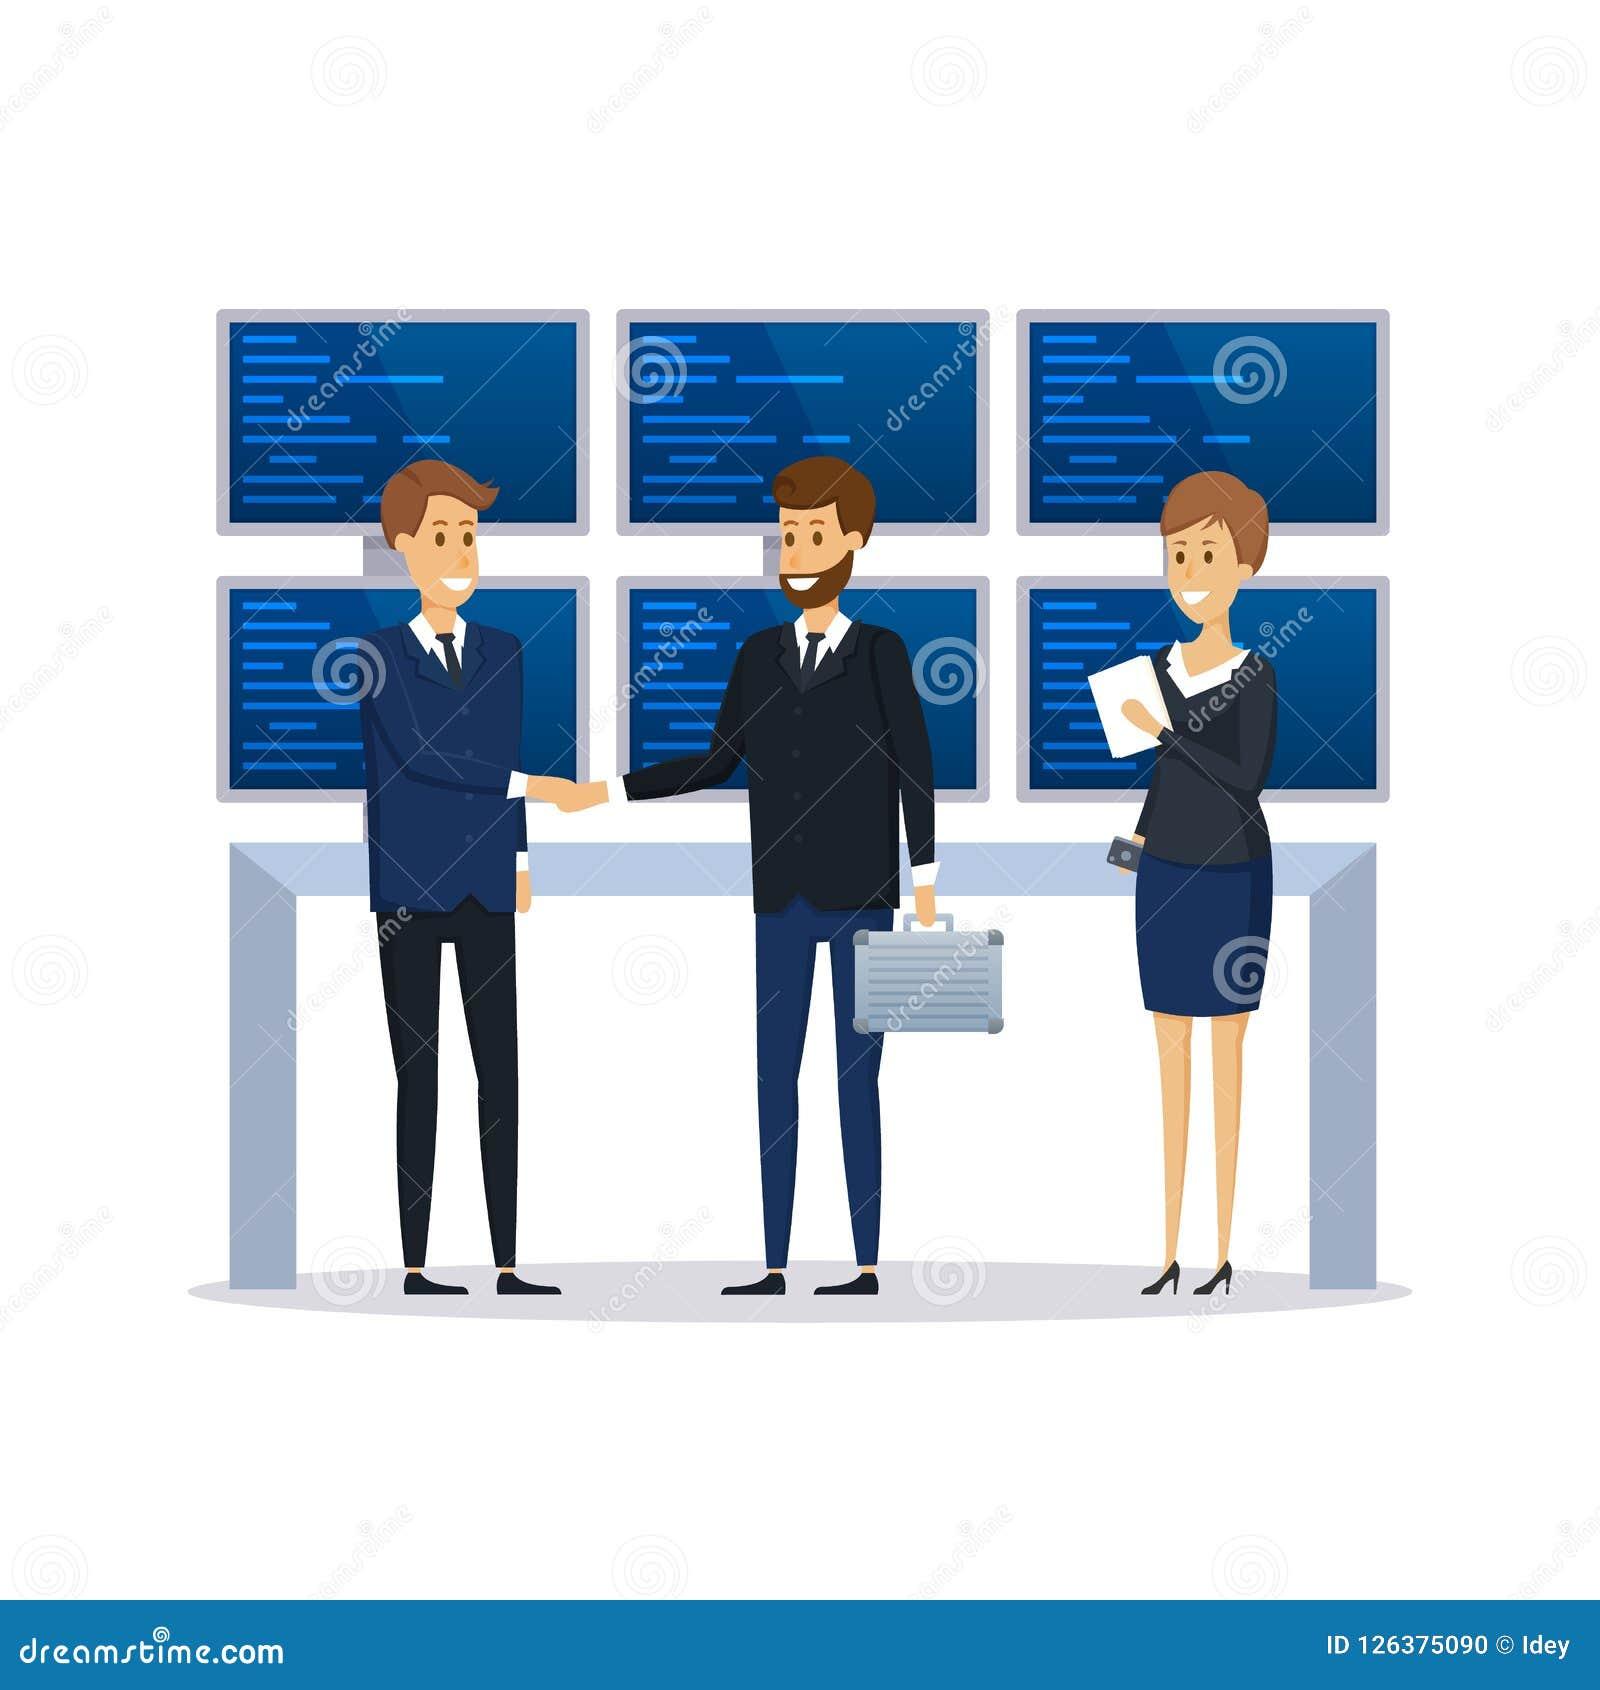 Werknemers van financiële organisatie, collega s, gedragsbespreking van gesprek